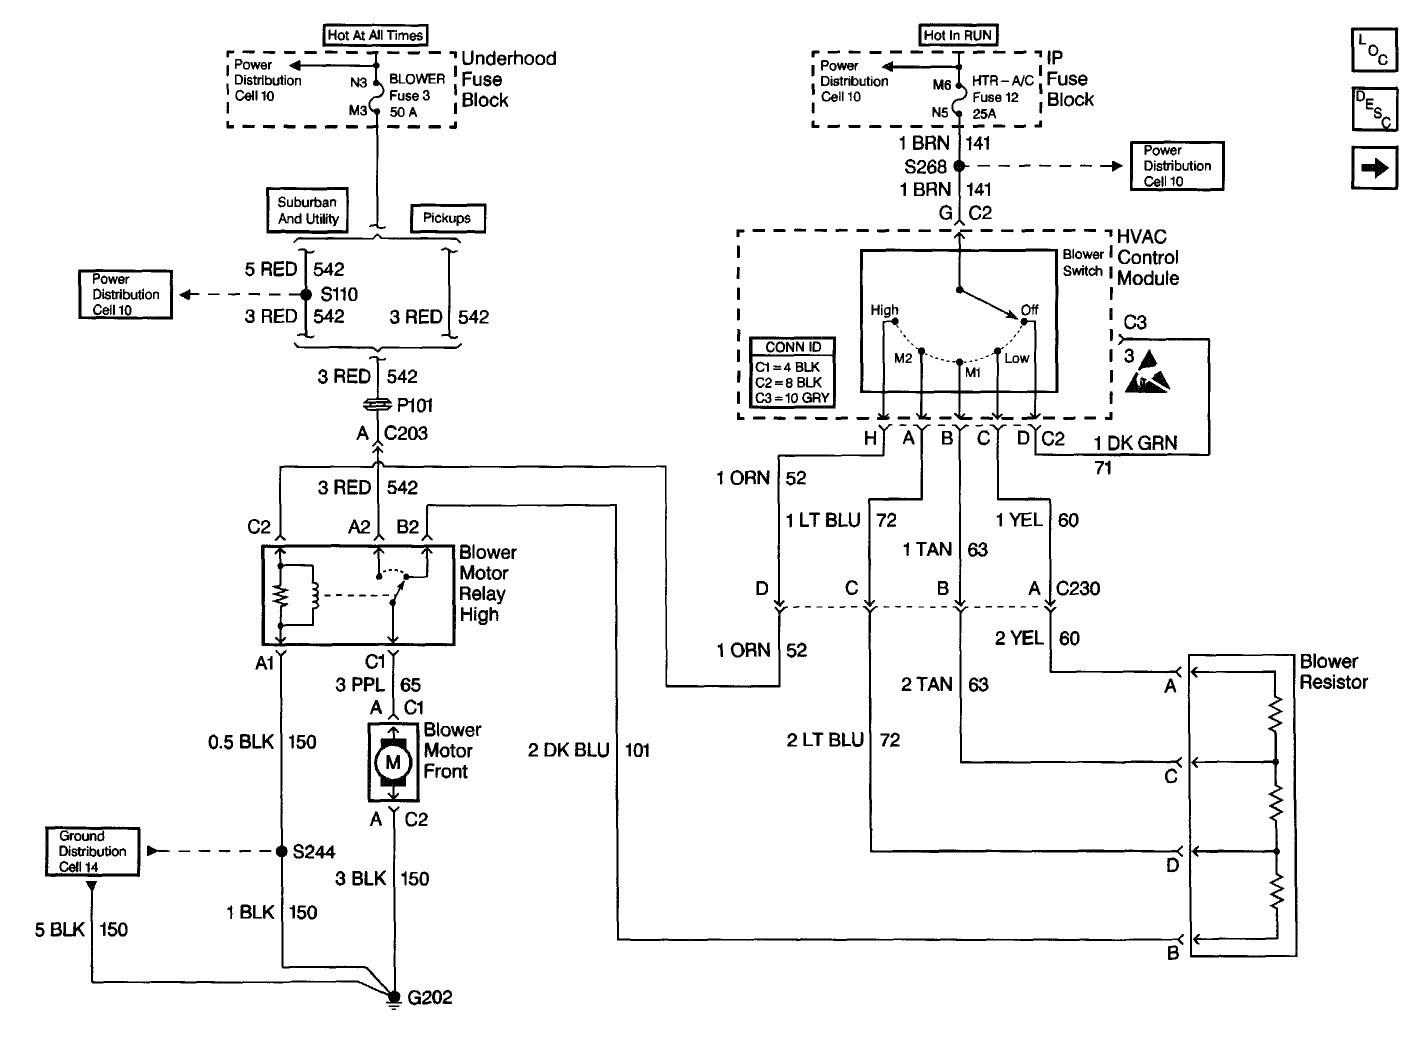 1999 Chevy Suburban Remote Start Wiring Diagram Nemetas Viper Starter Inspirational Image Rh Mainetreasurechest Com 5x05 Bulldog Security